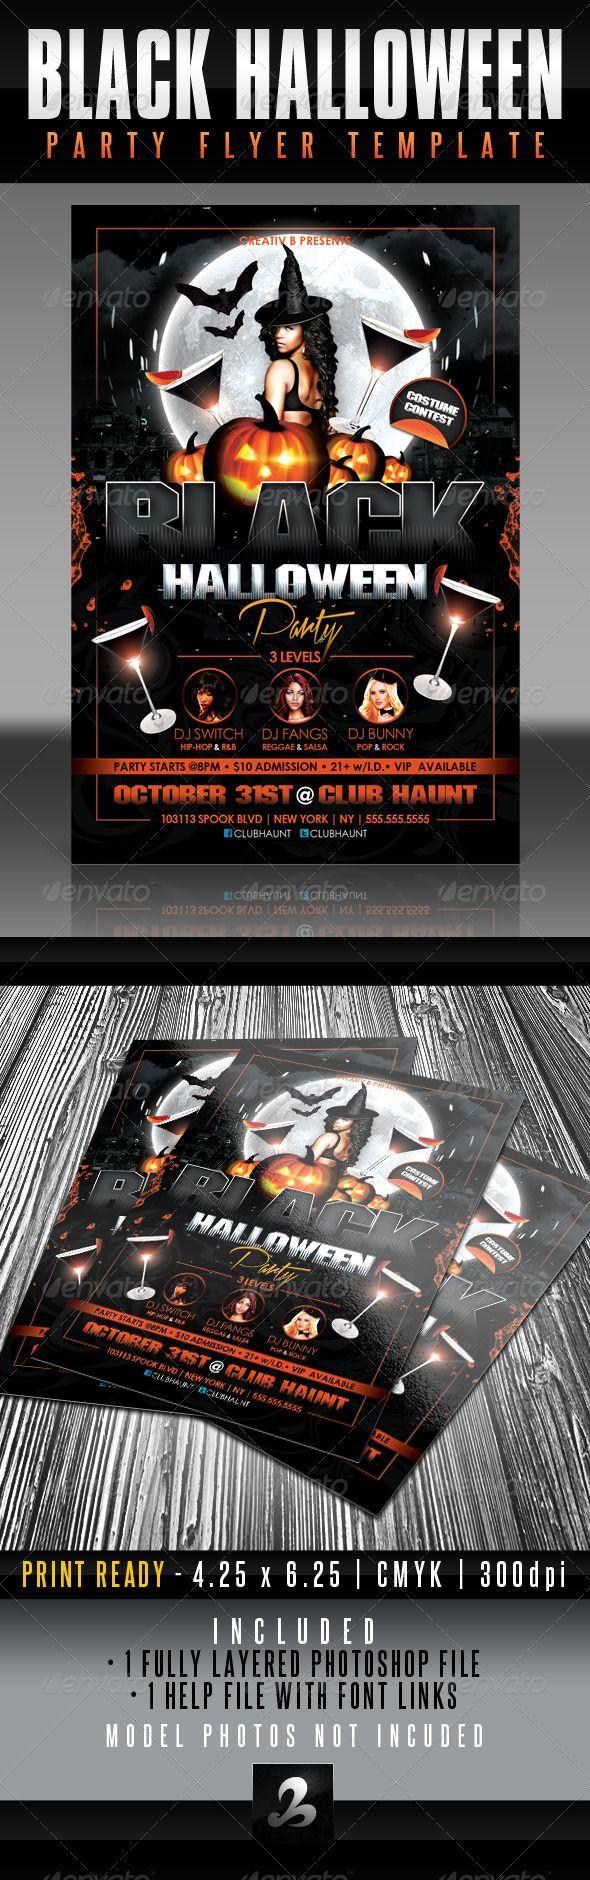 Black Halloween Party Flyer Template Halloween Party Flyer Party - Party invitation template: halloween costume party flyer